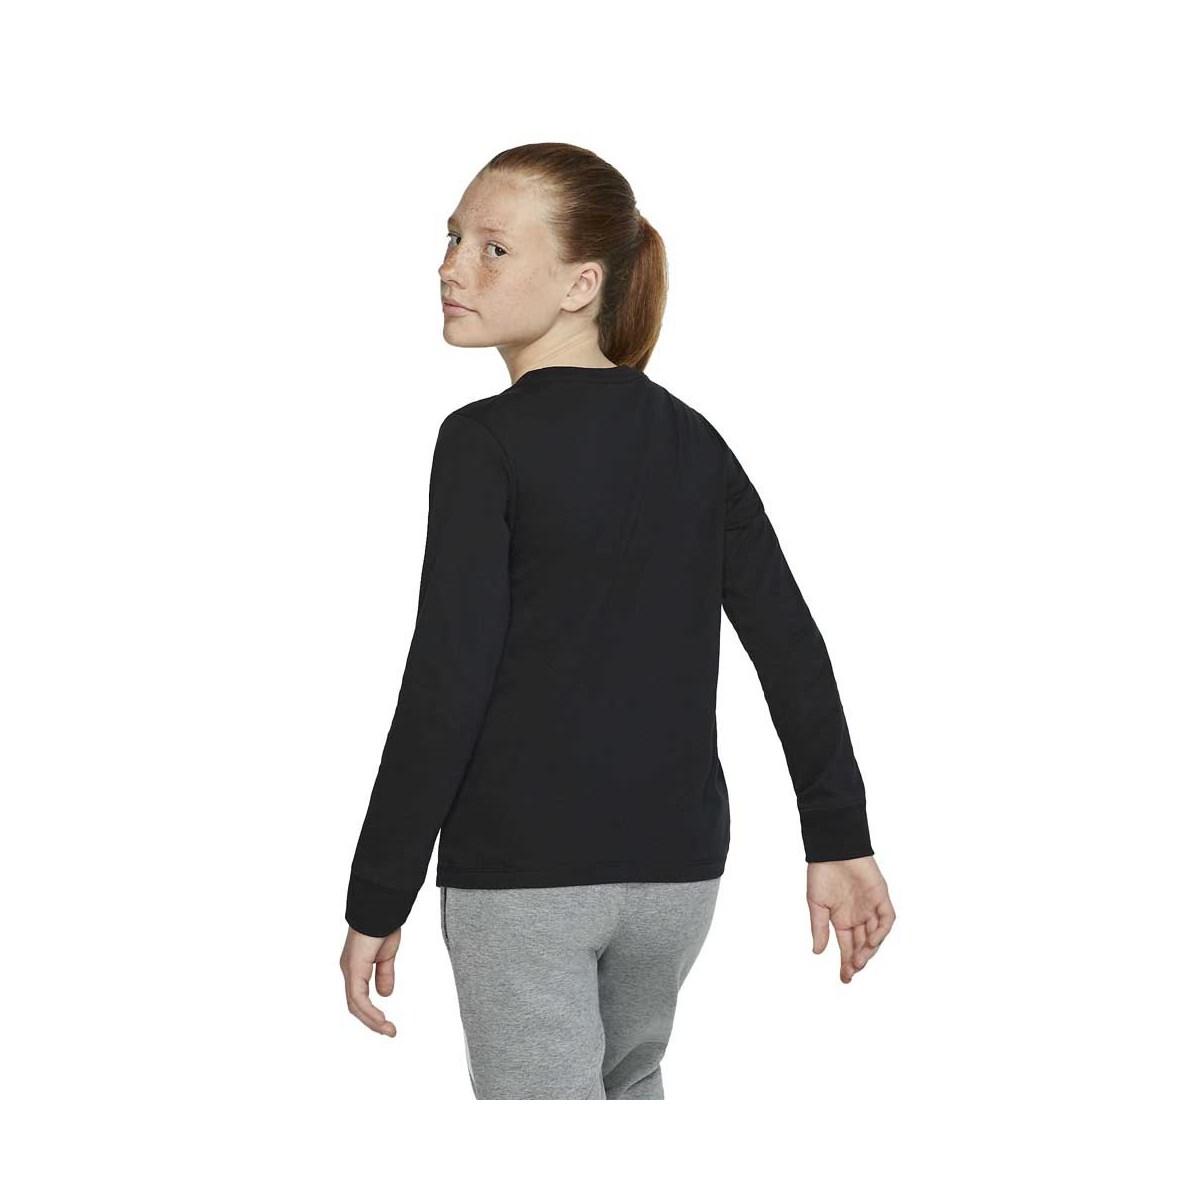 Essentials Futura Hook Çocuk Siyah Sweatshirt (CI8295-010)